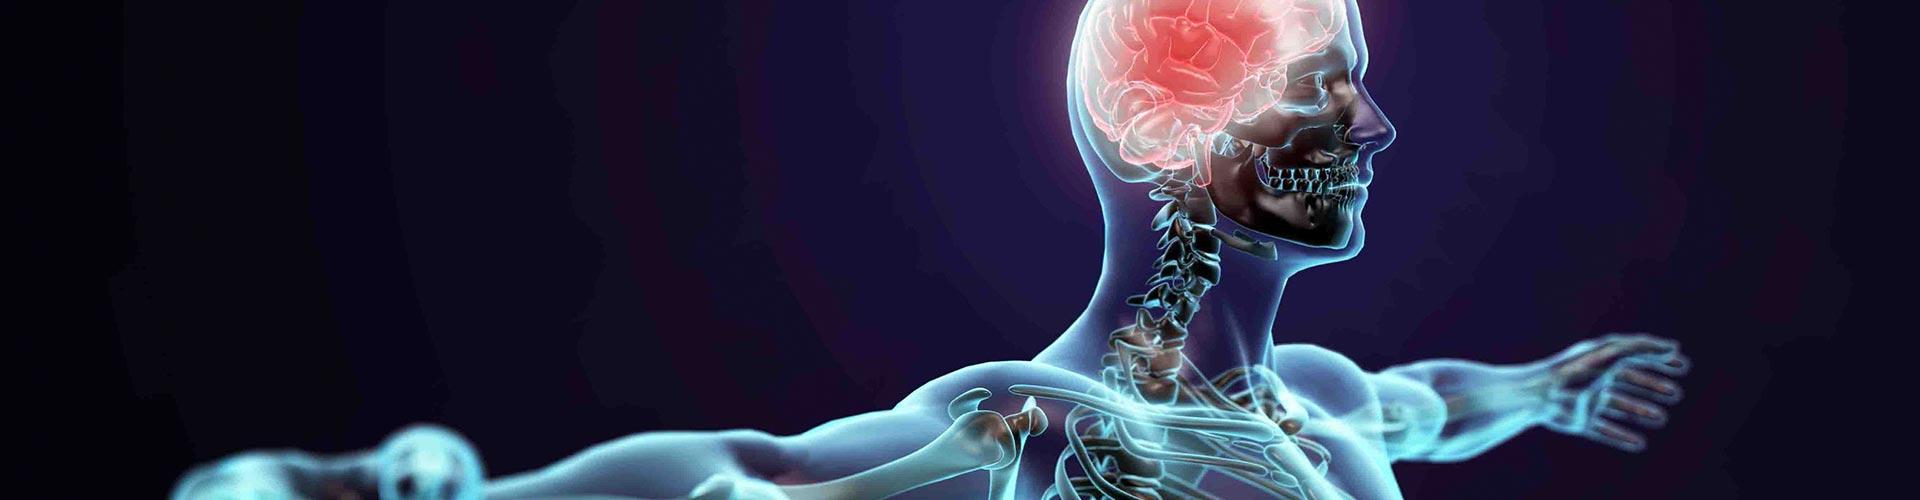 cns diseases parkinson stroke bbb passage microdialysis